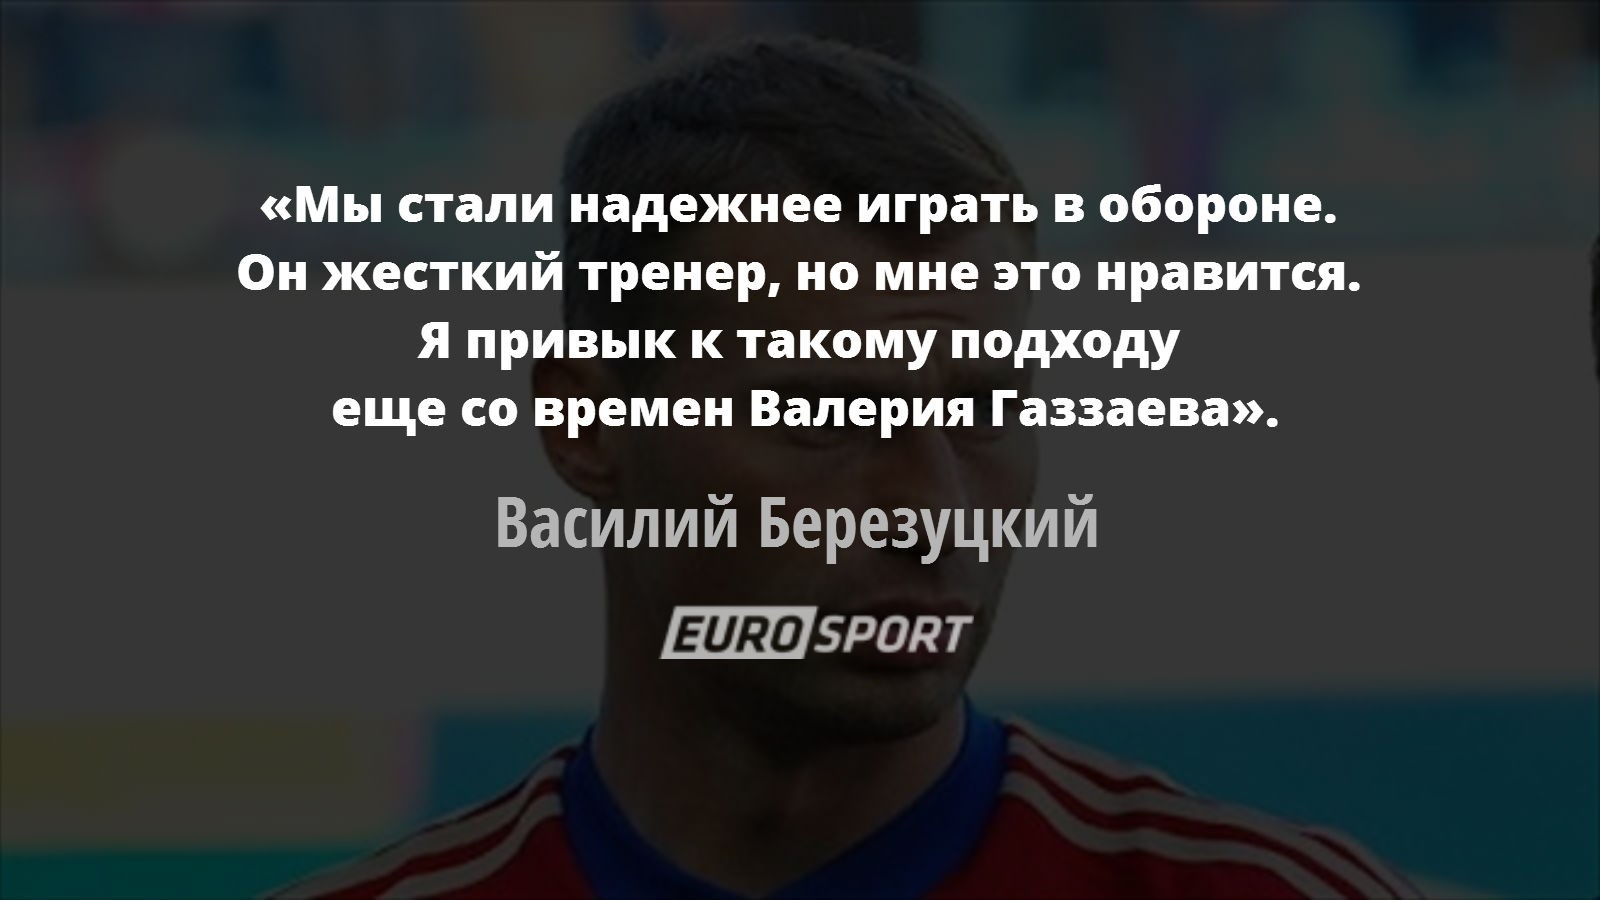 https://i.eurosport.com/2015/07/13/1639150.jpg